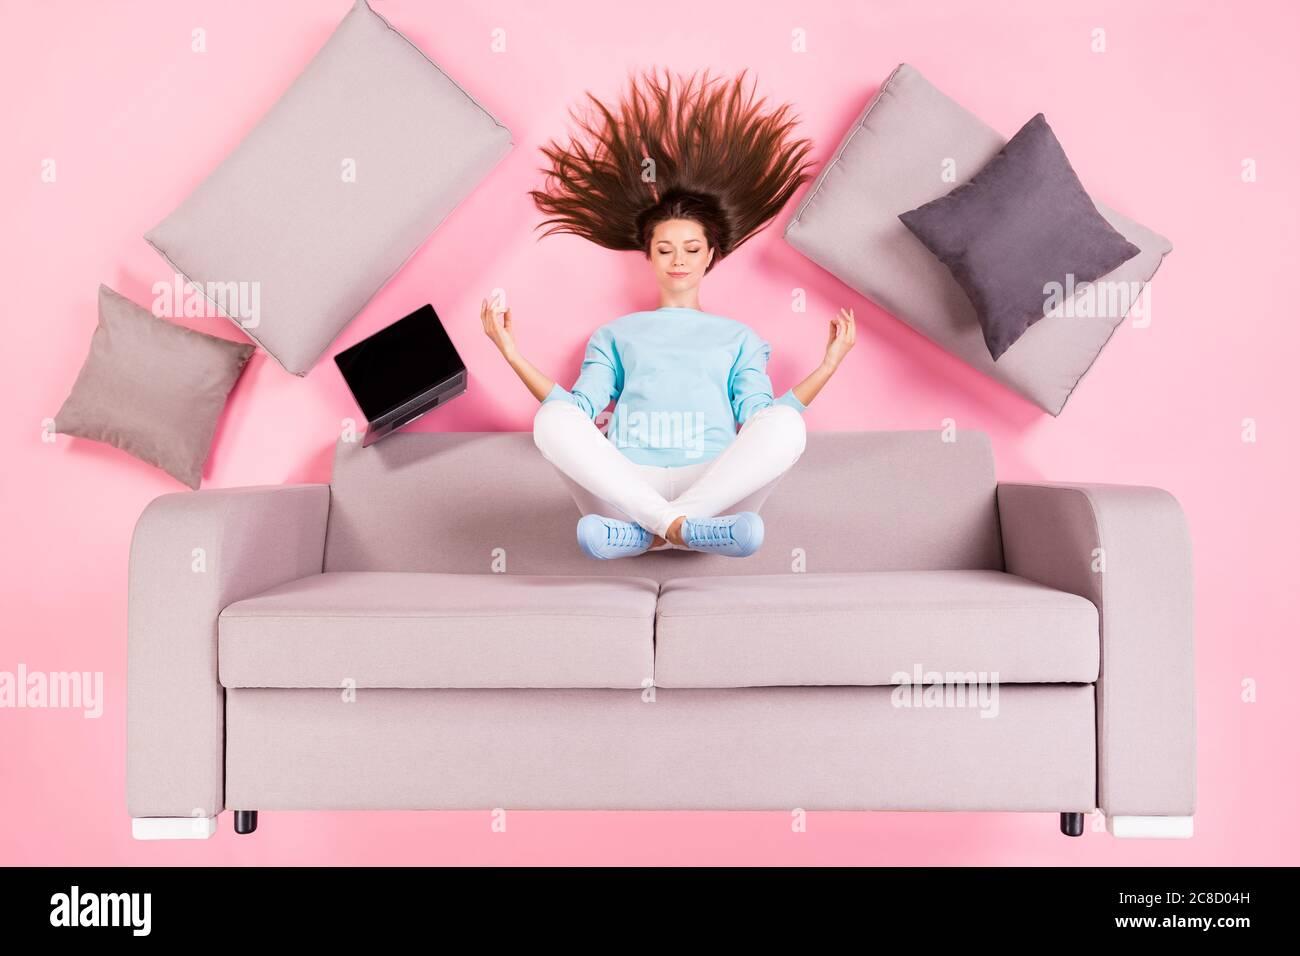 Vista superior sobre el concepto de flat lay plano de ángulo alto de ella ella bonita atractiva tranquila enfocada niña sentada en diván meditando chakra asana Foto de stock